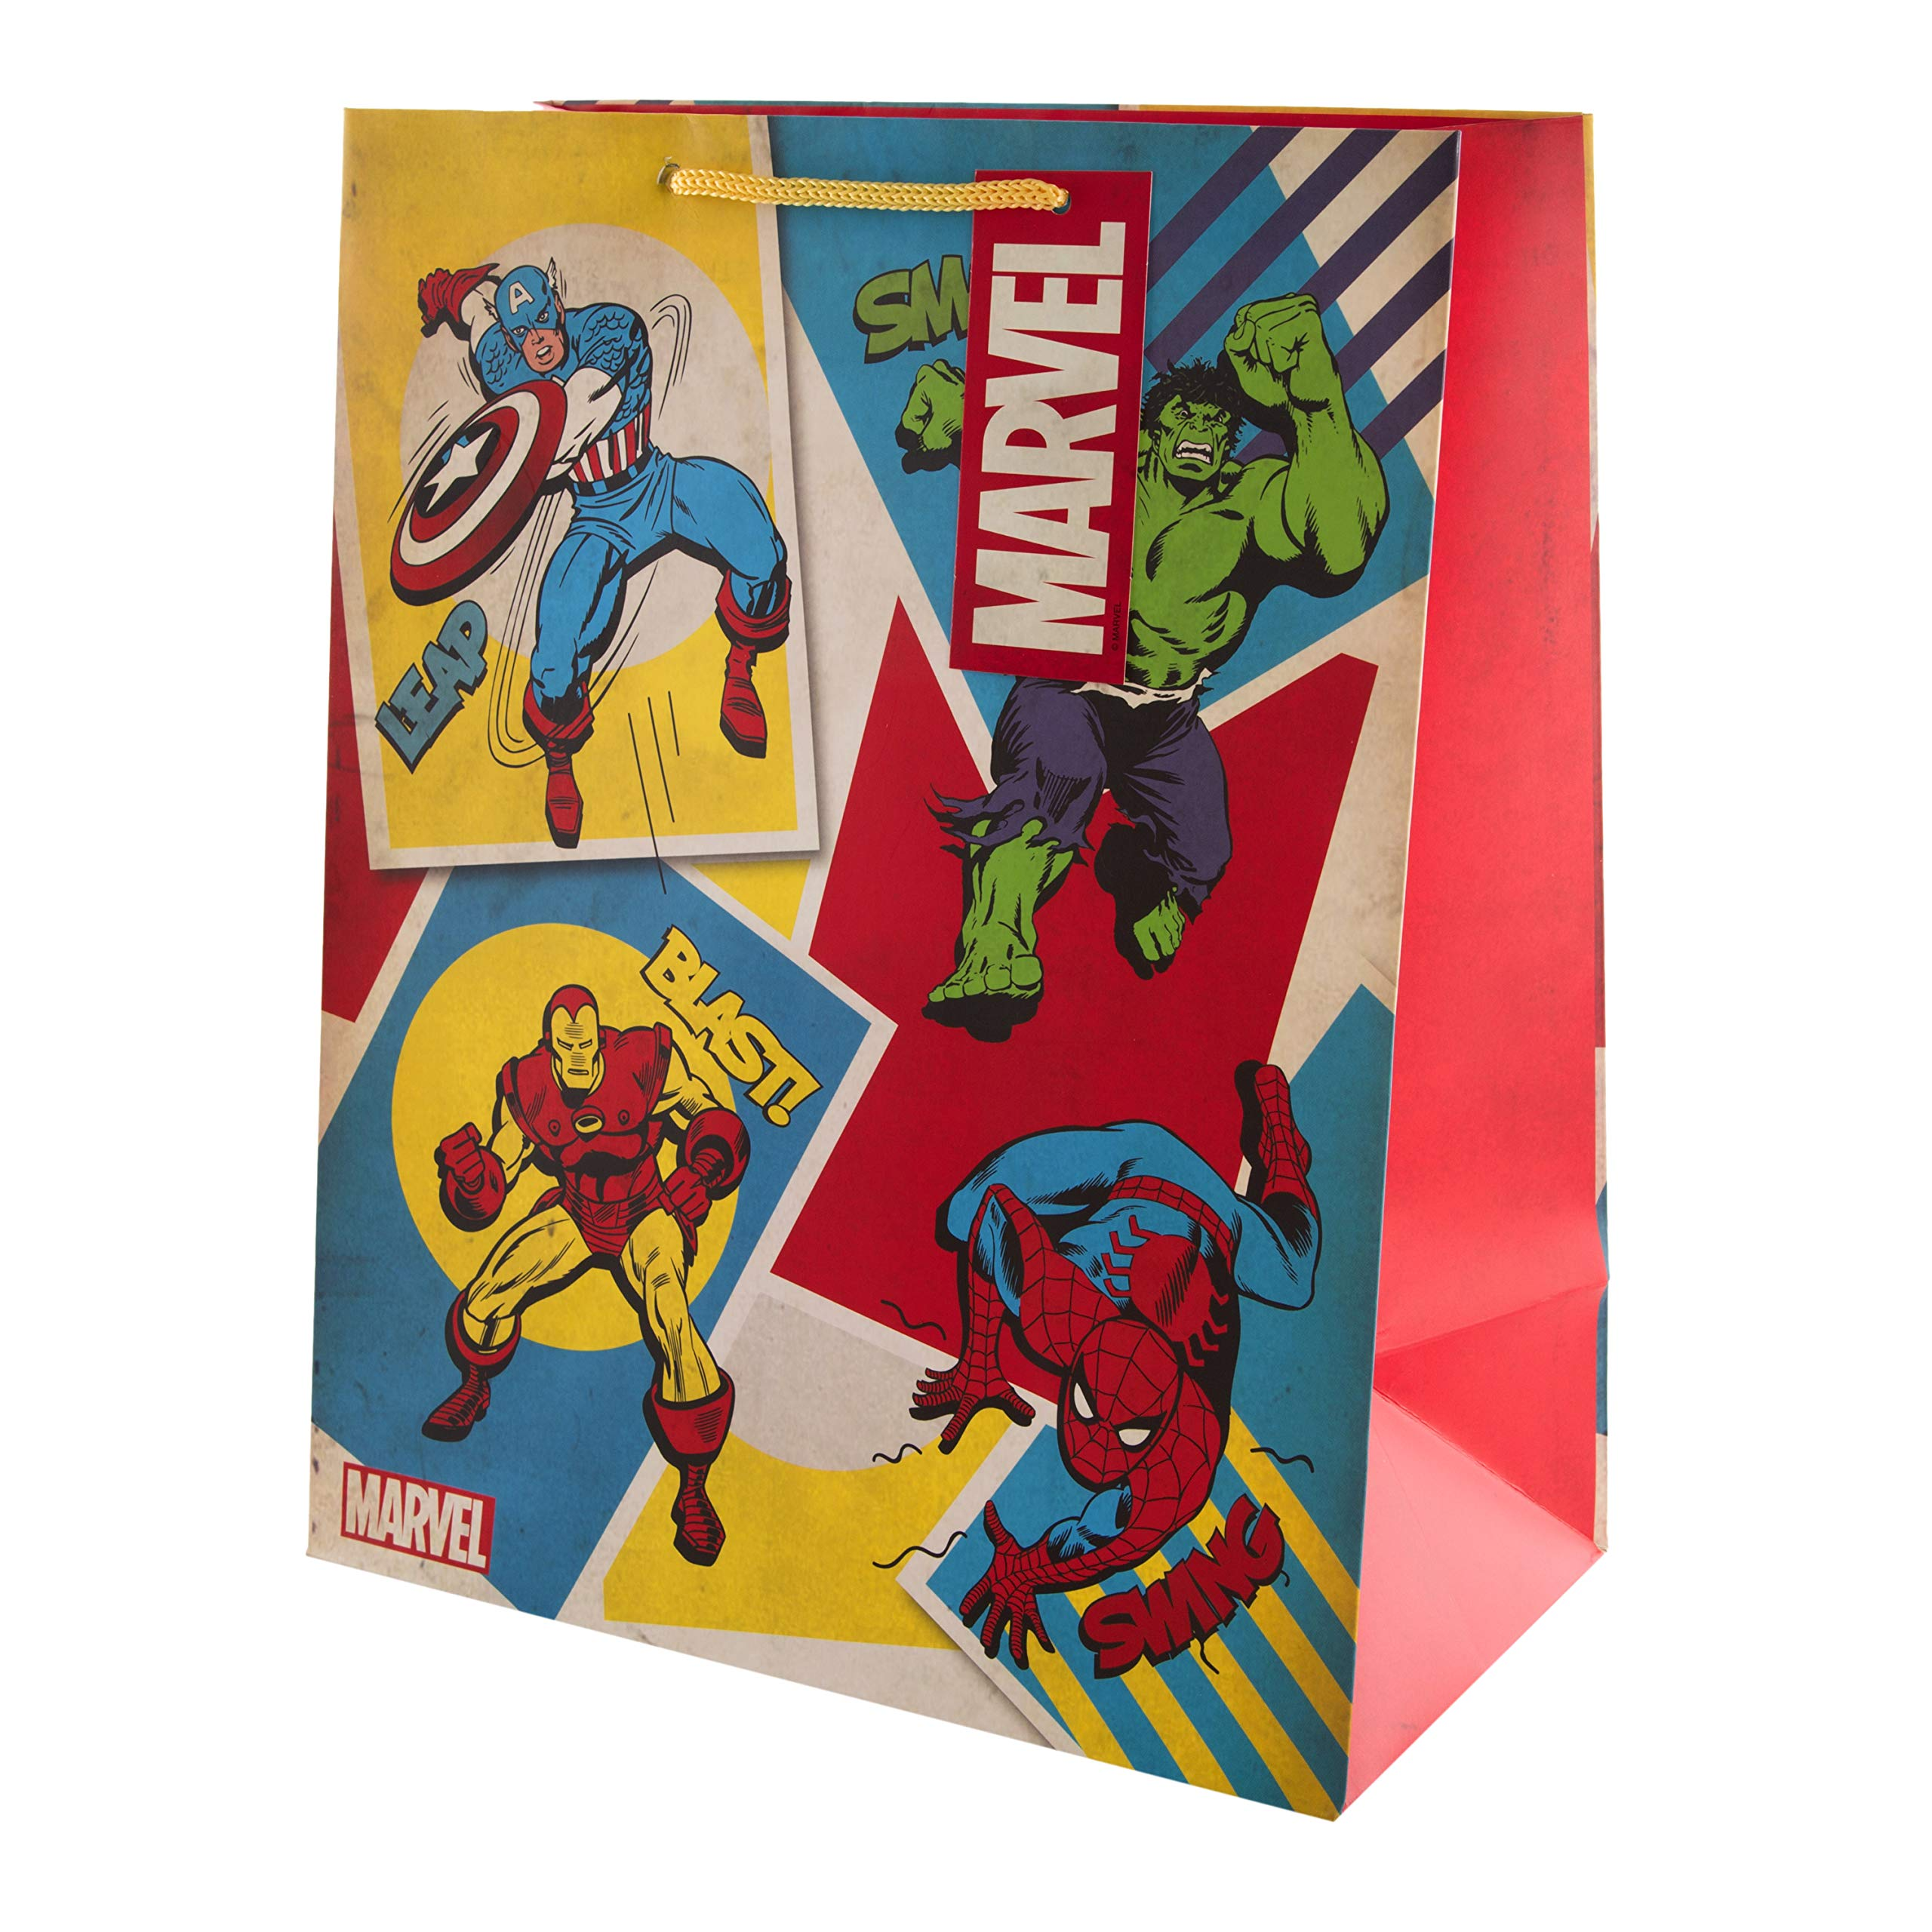 Multi-Occasion Marvel Gift Bag from Hallmark - Superhero Design - Large (Birthday, Christmas, Exam Congrats, Father's Day)